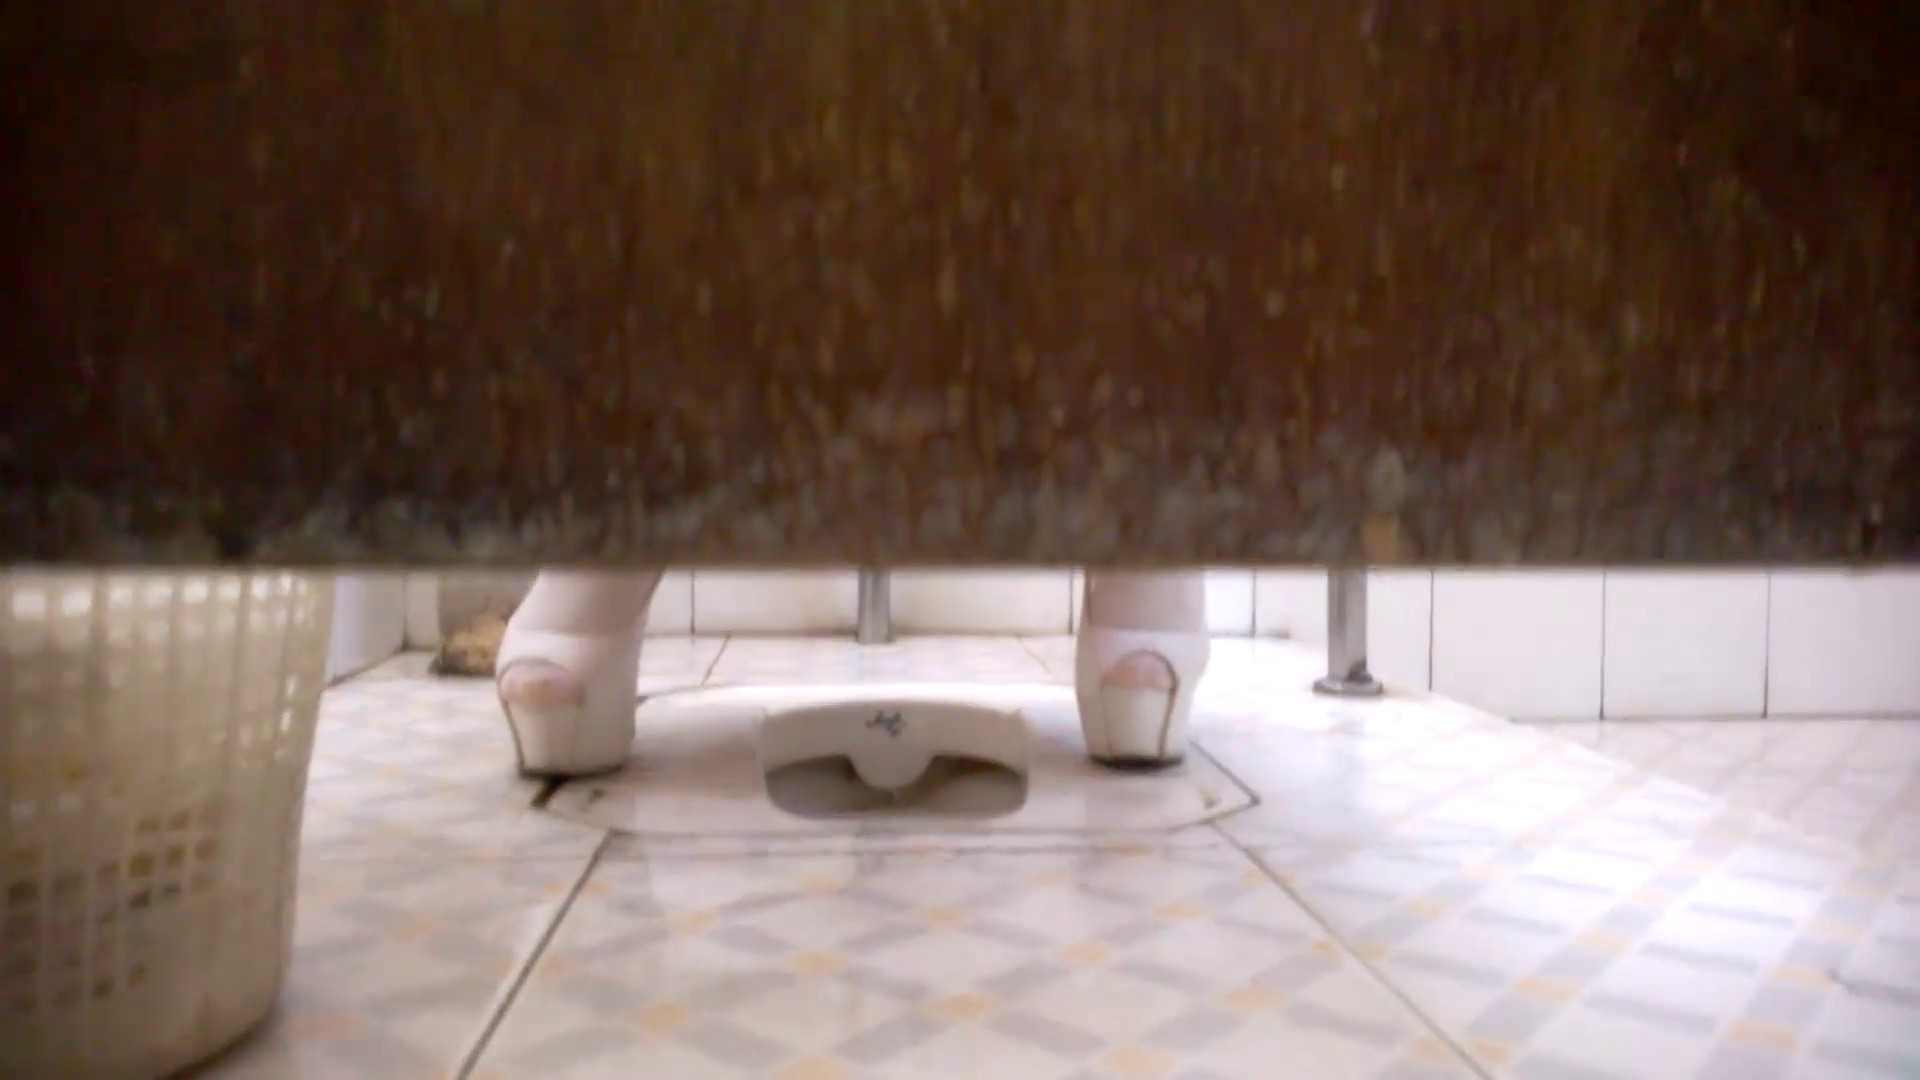 JD盗撮 美女の洗面所の秘密 Vol.40 盗撮 おまんこ無修正動画無料 68pic 3